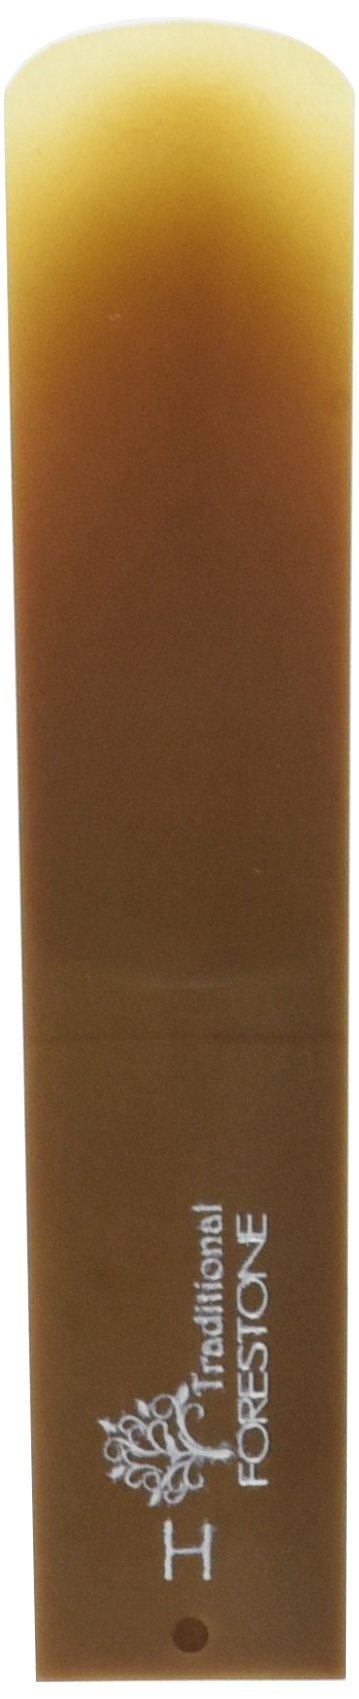 Forestone - FBS040 Baritone Saxophone Reed F4 - Brown